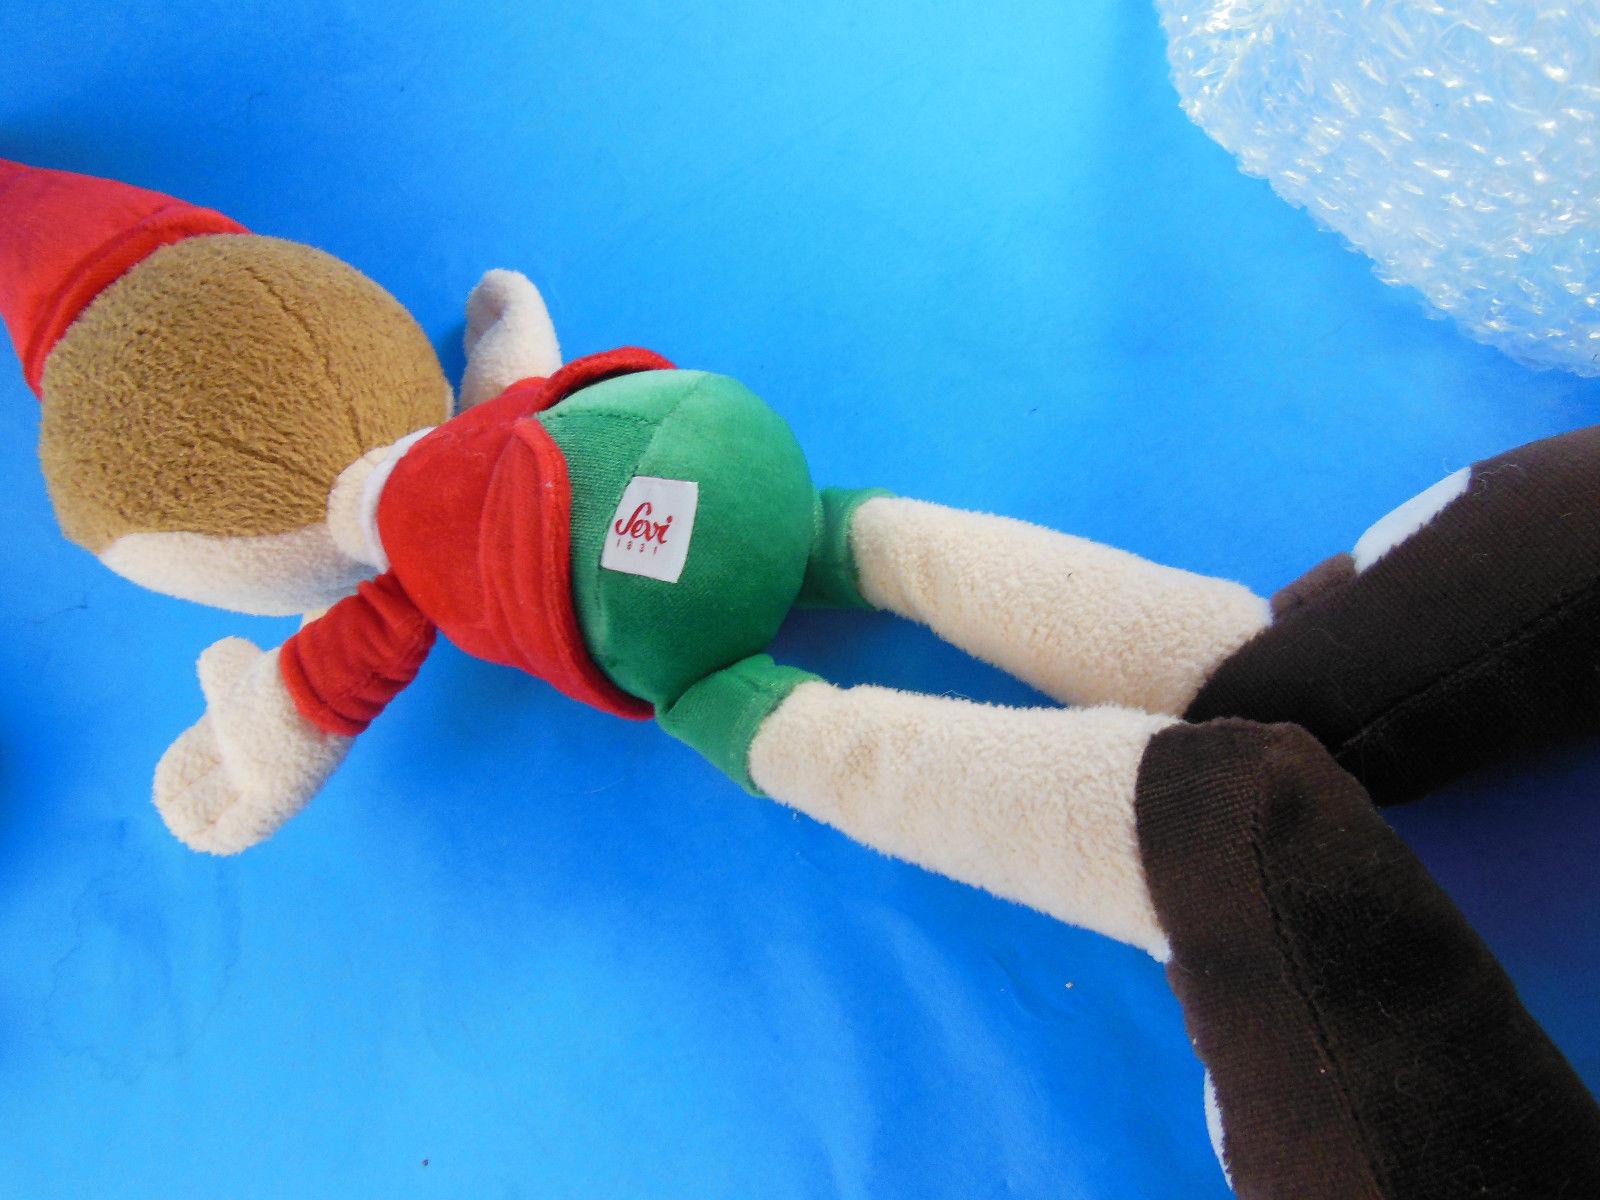 "Sevi PINOCCHIO Elf Doll 17"" Plush Trudi Spa Stuffed ToyPlush toy Rare HTF"